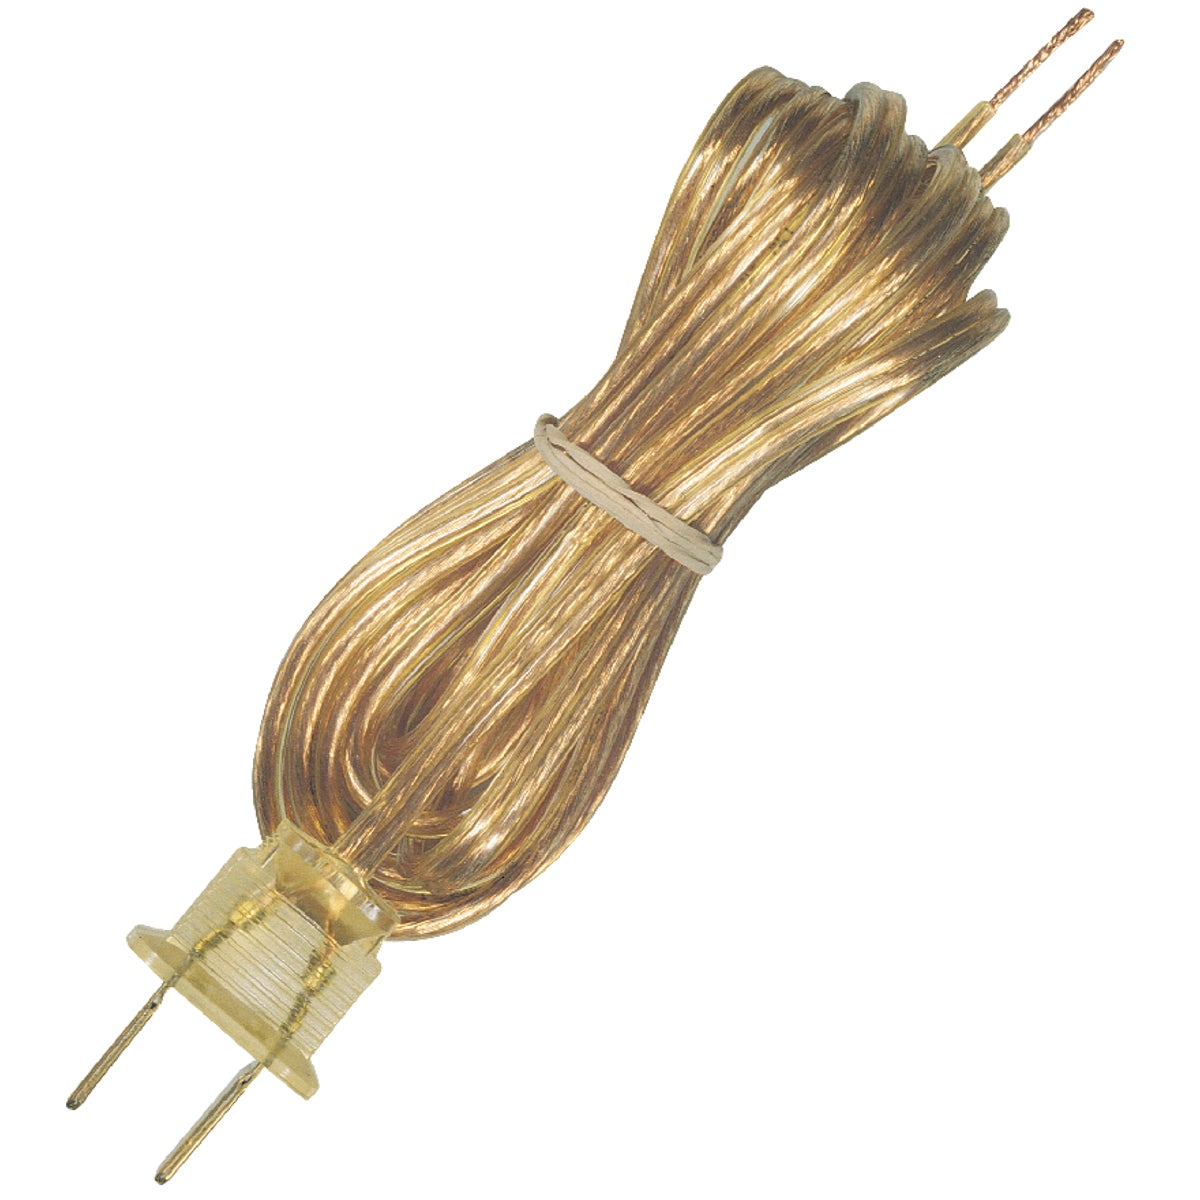 8' GOLD LAMP CORD